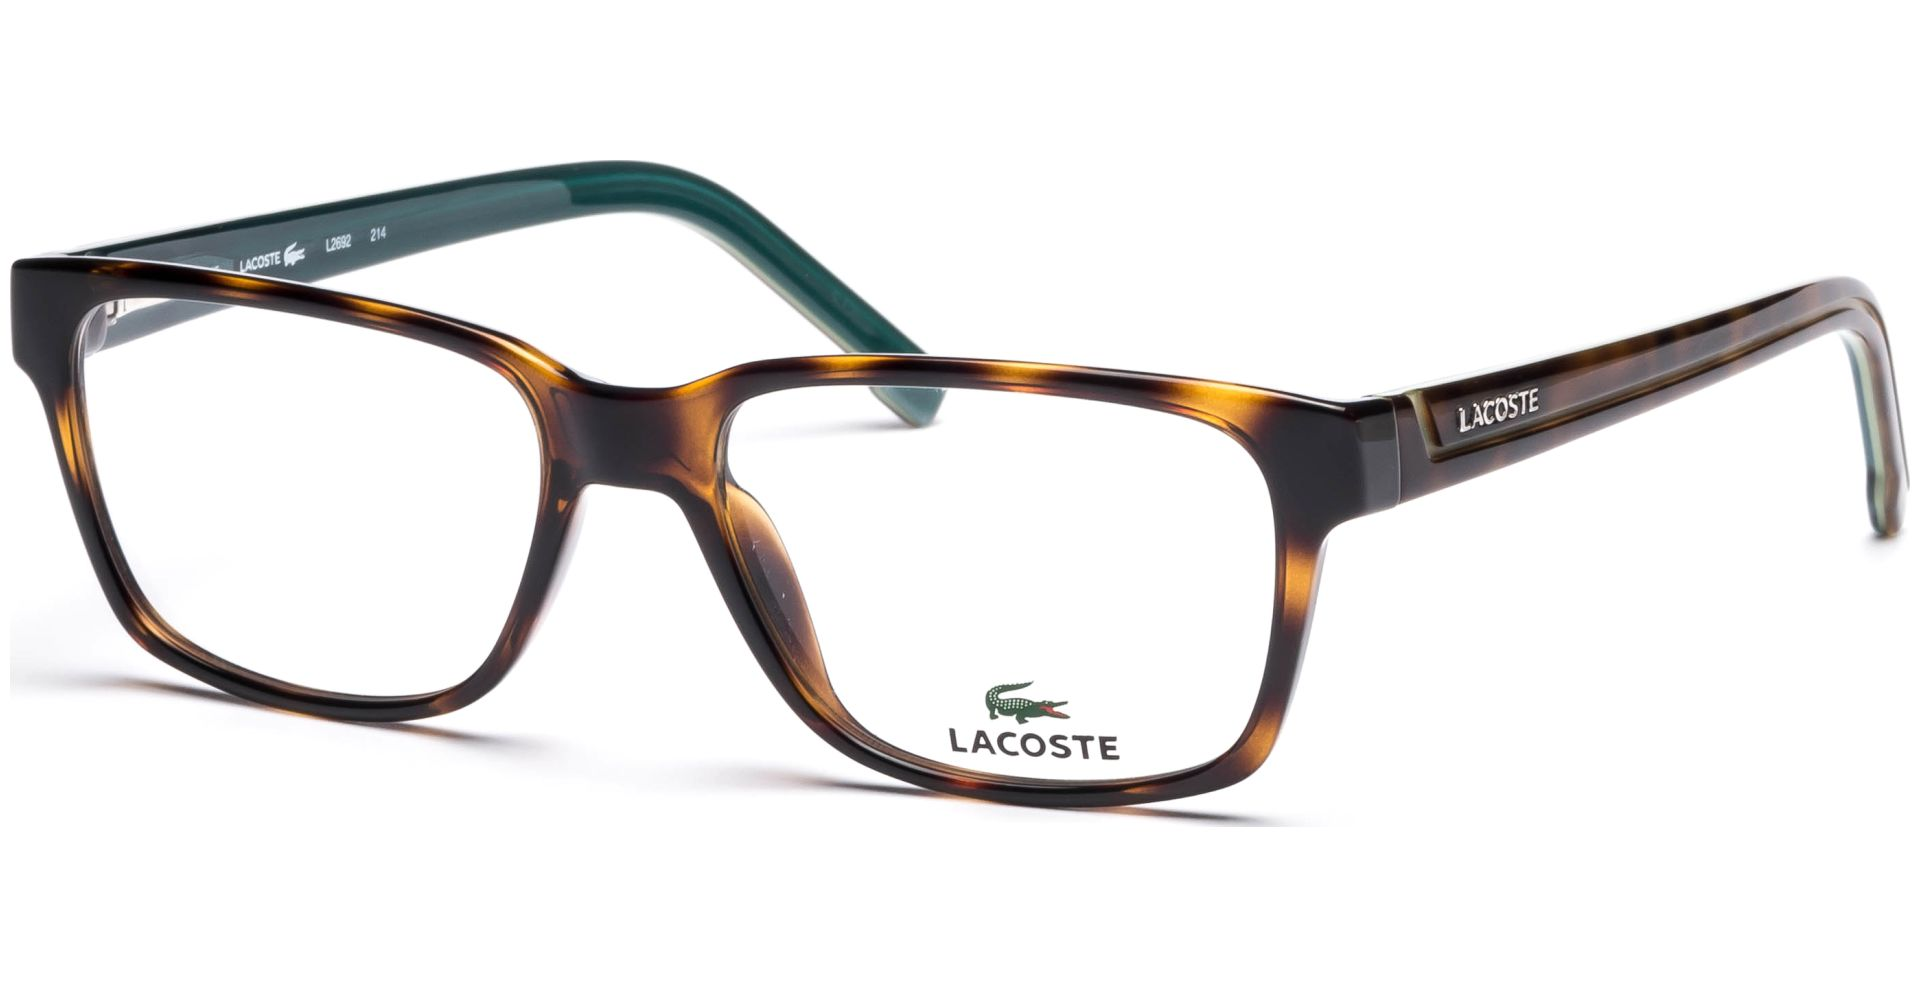 Lacoste - L2692 214 5417 Havana - von Lensbest